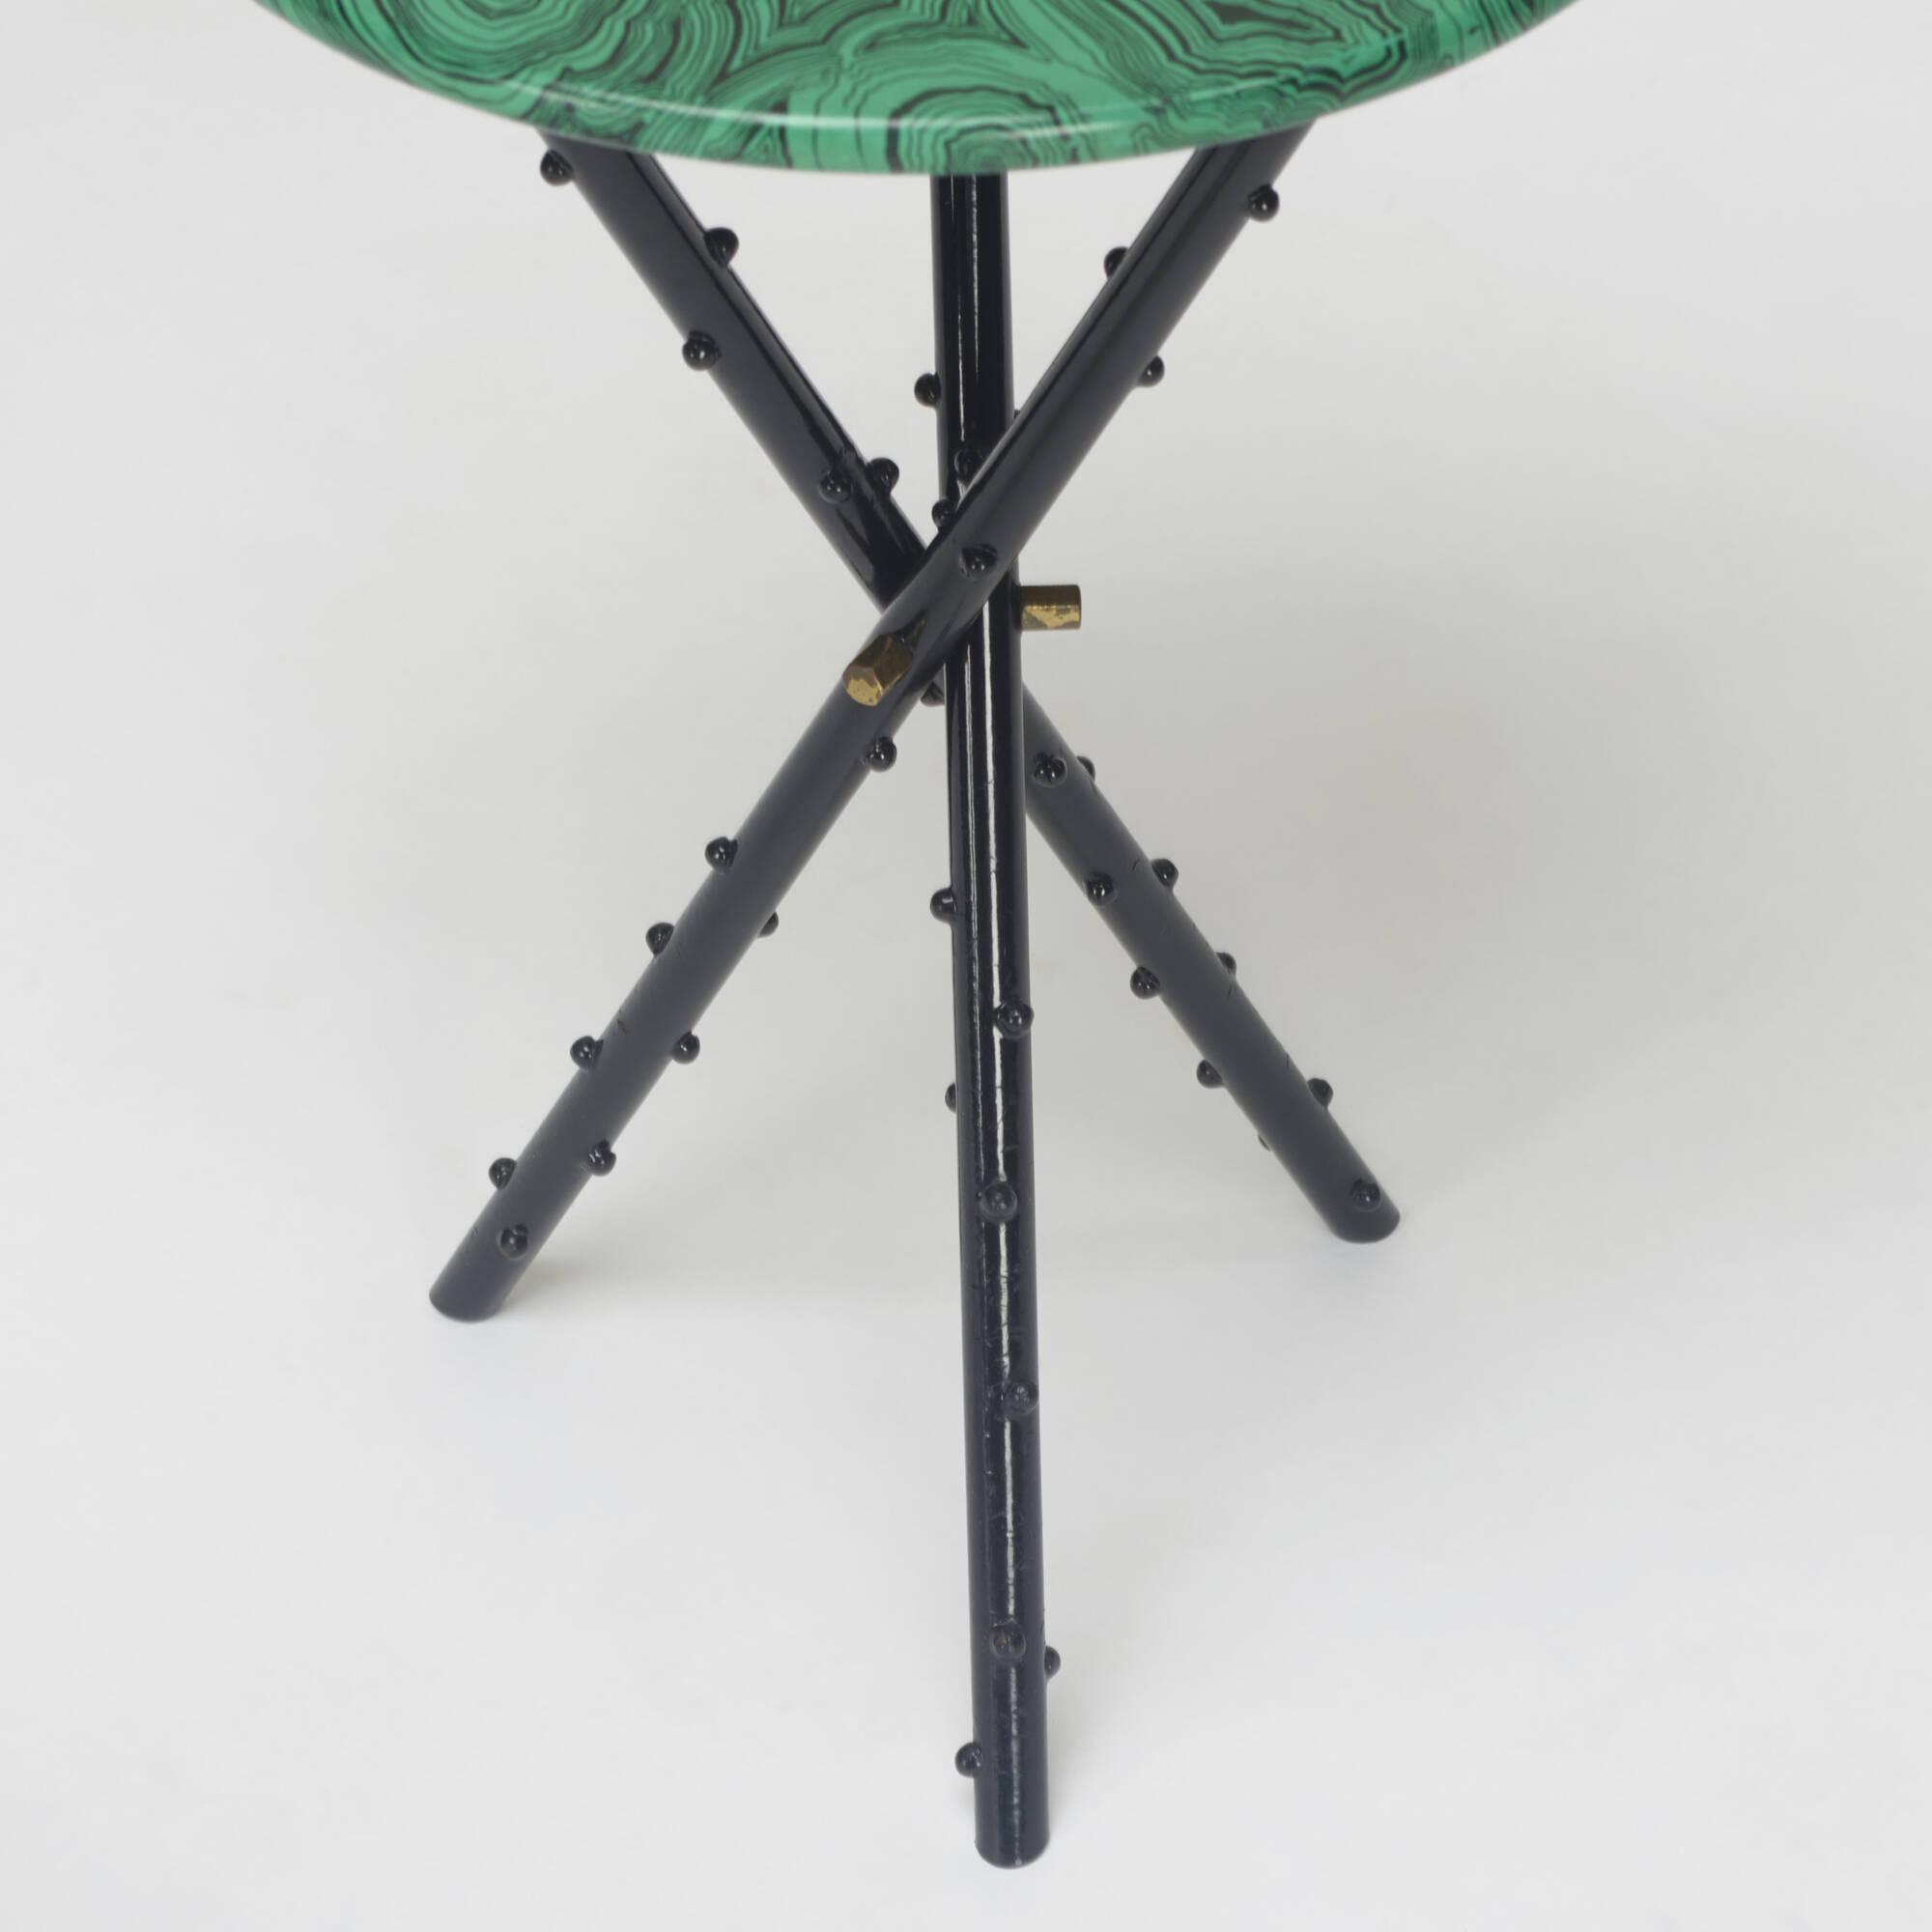 289: Piero Fornasetti / Malachite occasional tables, pair (3 of 3)